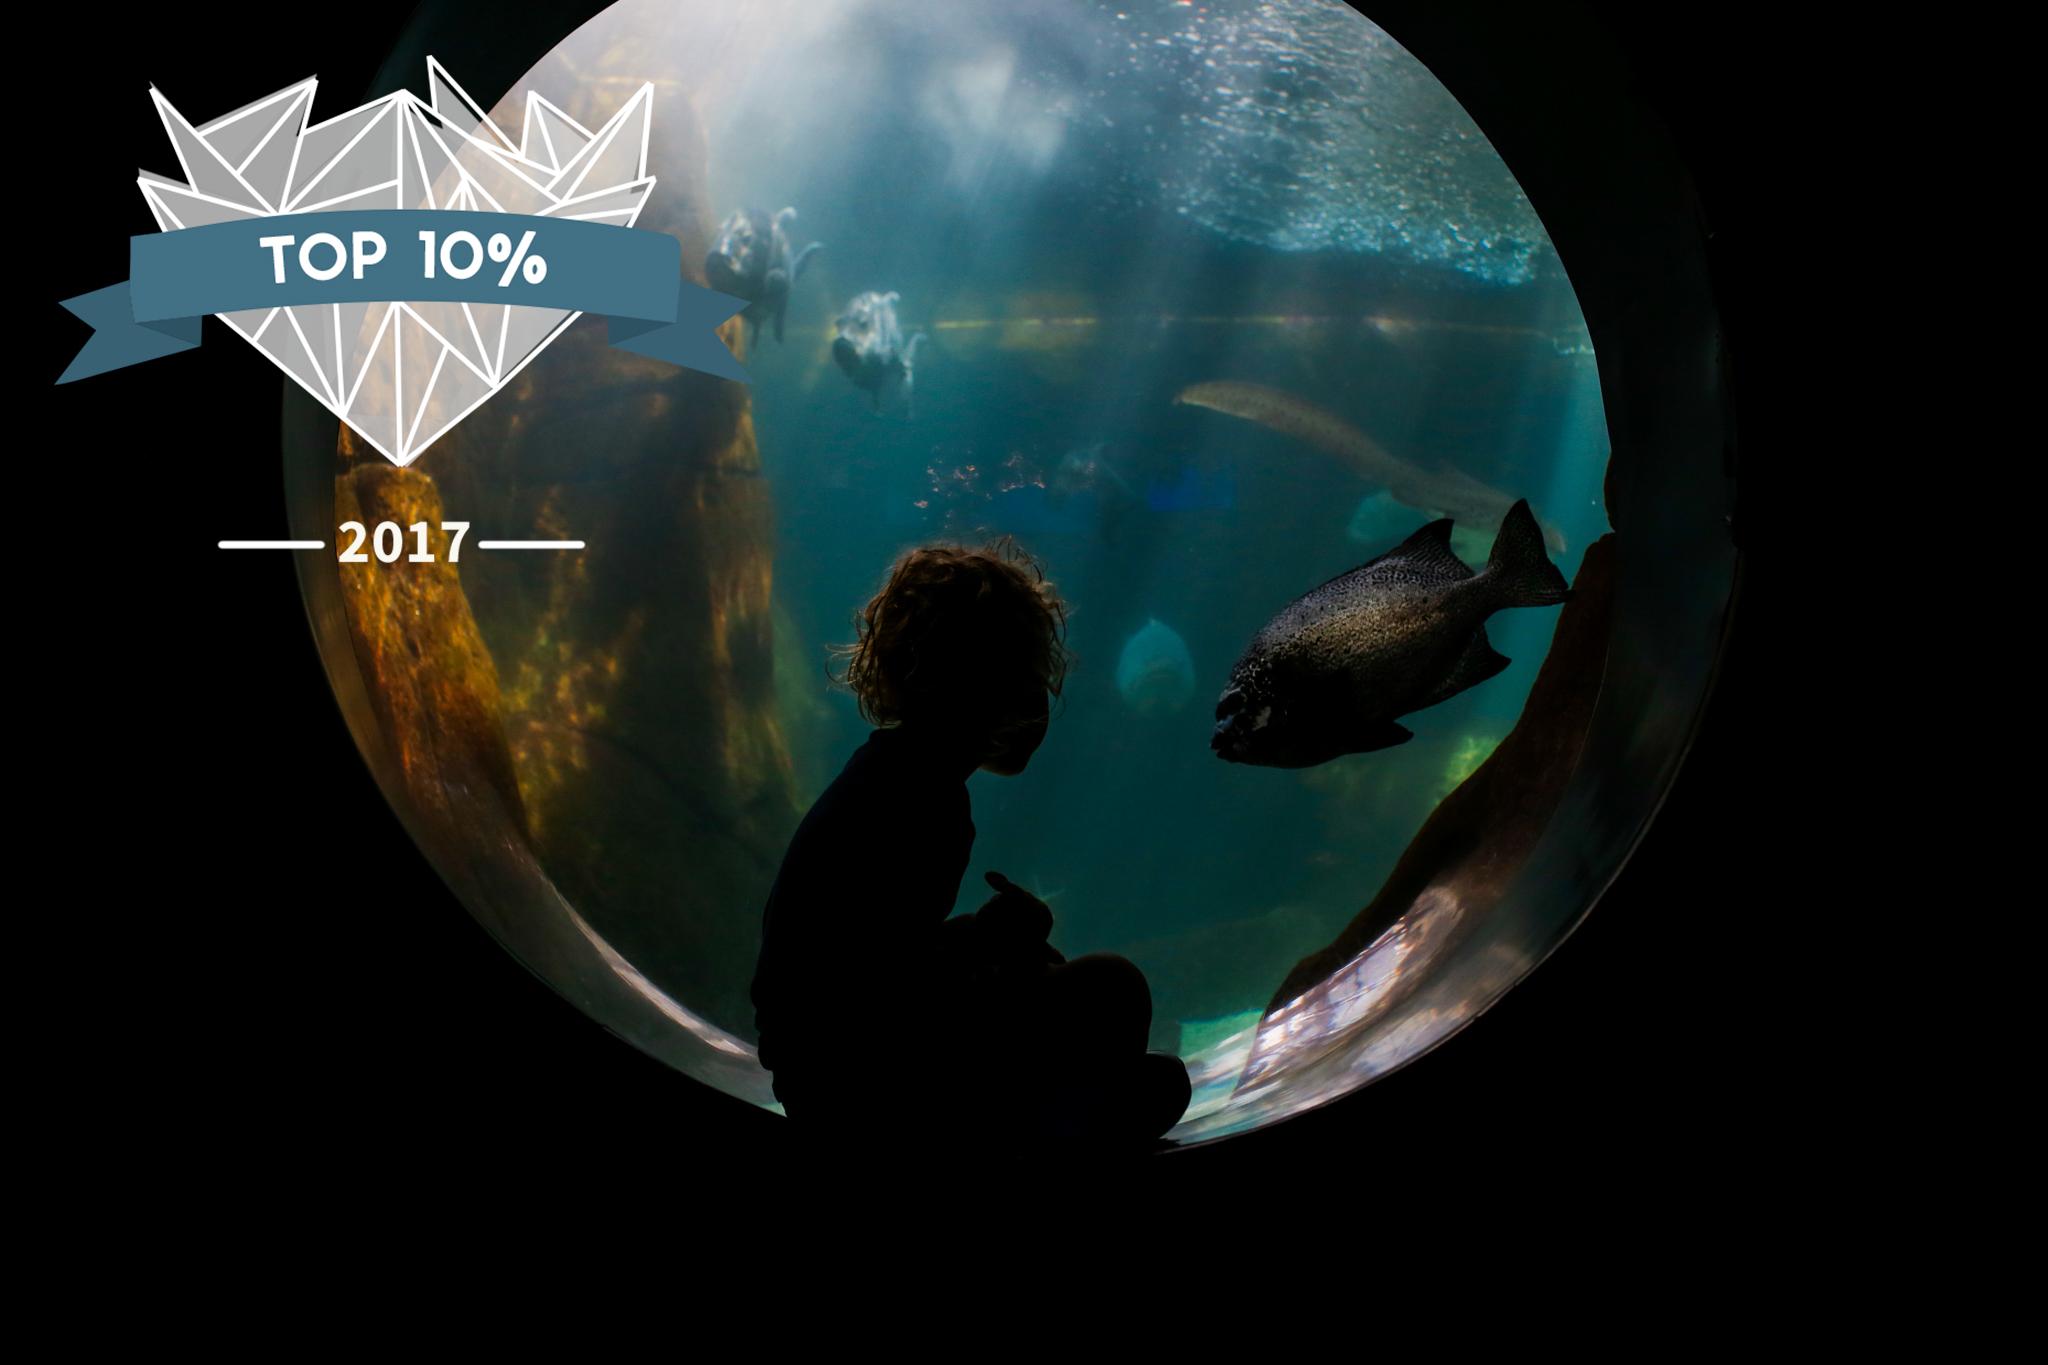 non watermarked 2017 shoot and share photo awards aloha sunshine photography 16October 13, 2016.jpg